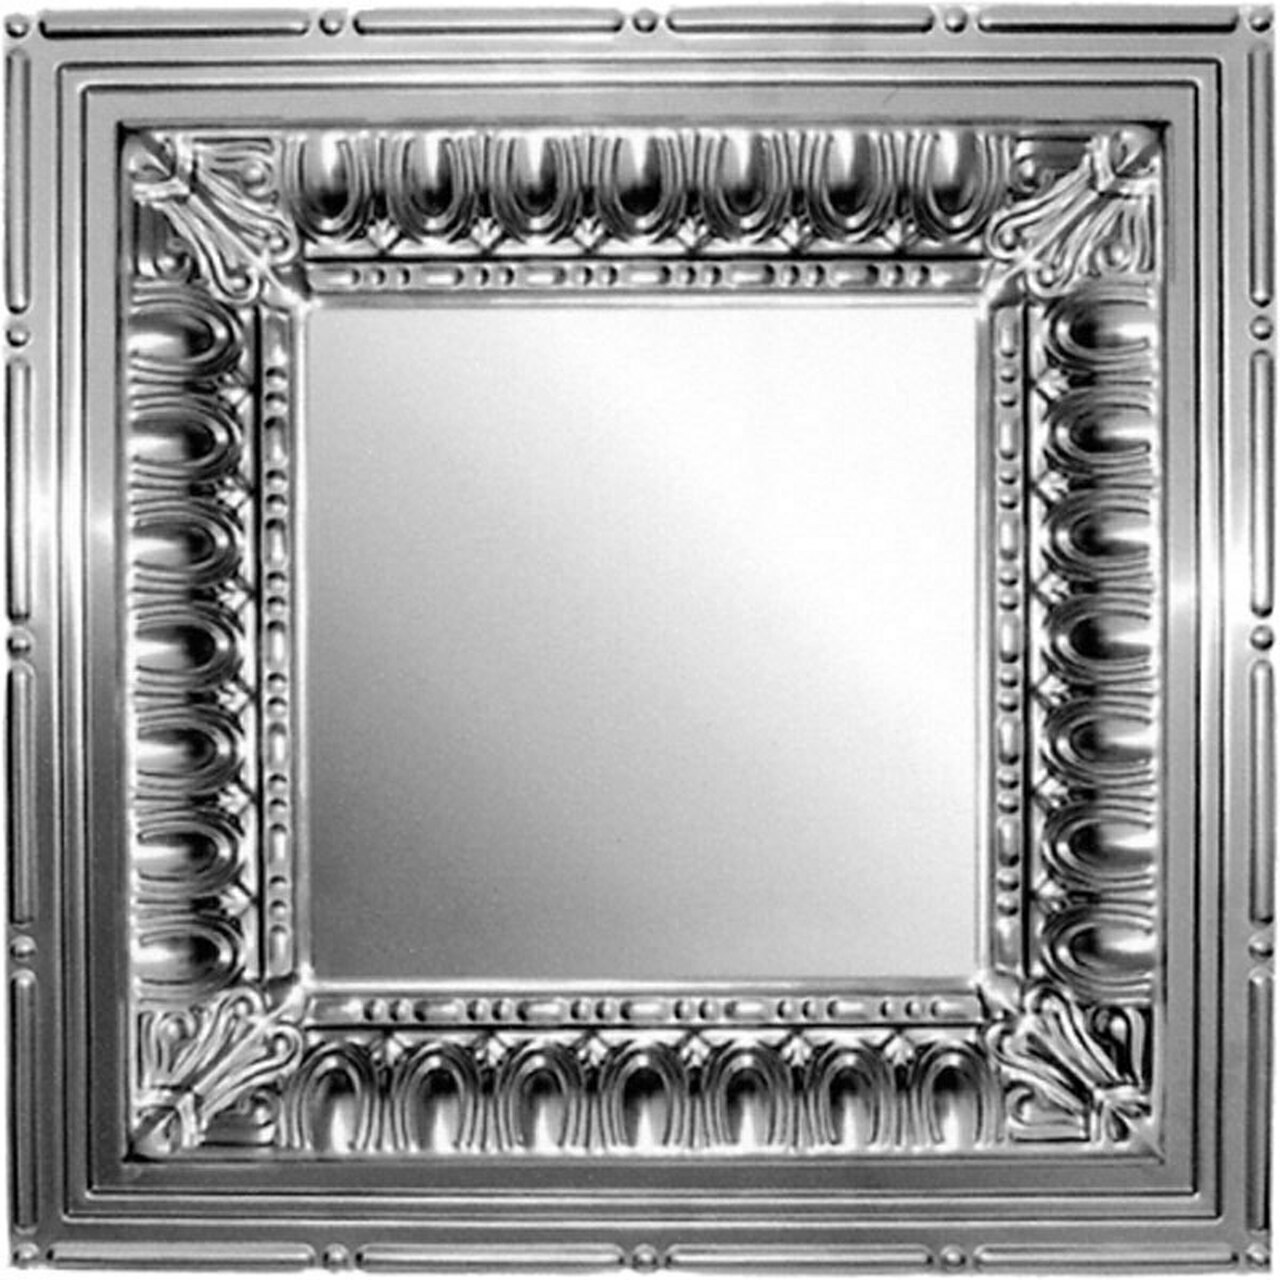 Rossini - Shanko Tin Plated Steel Ceiling Tile - #508